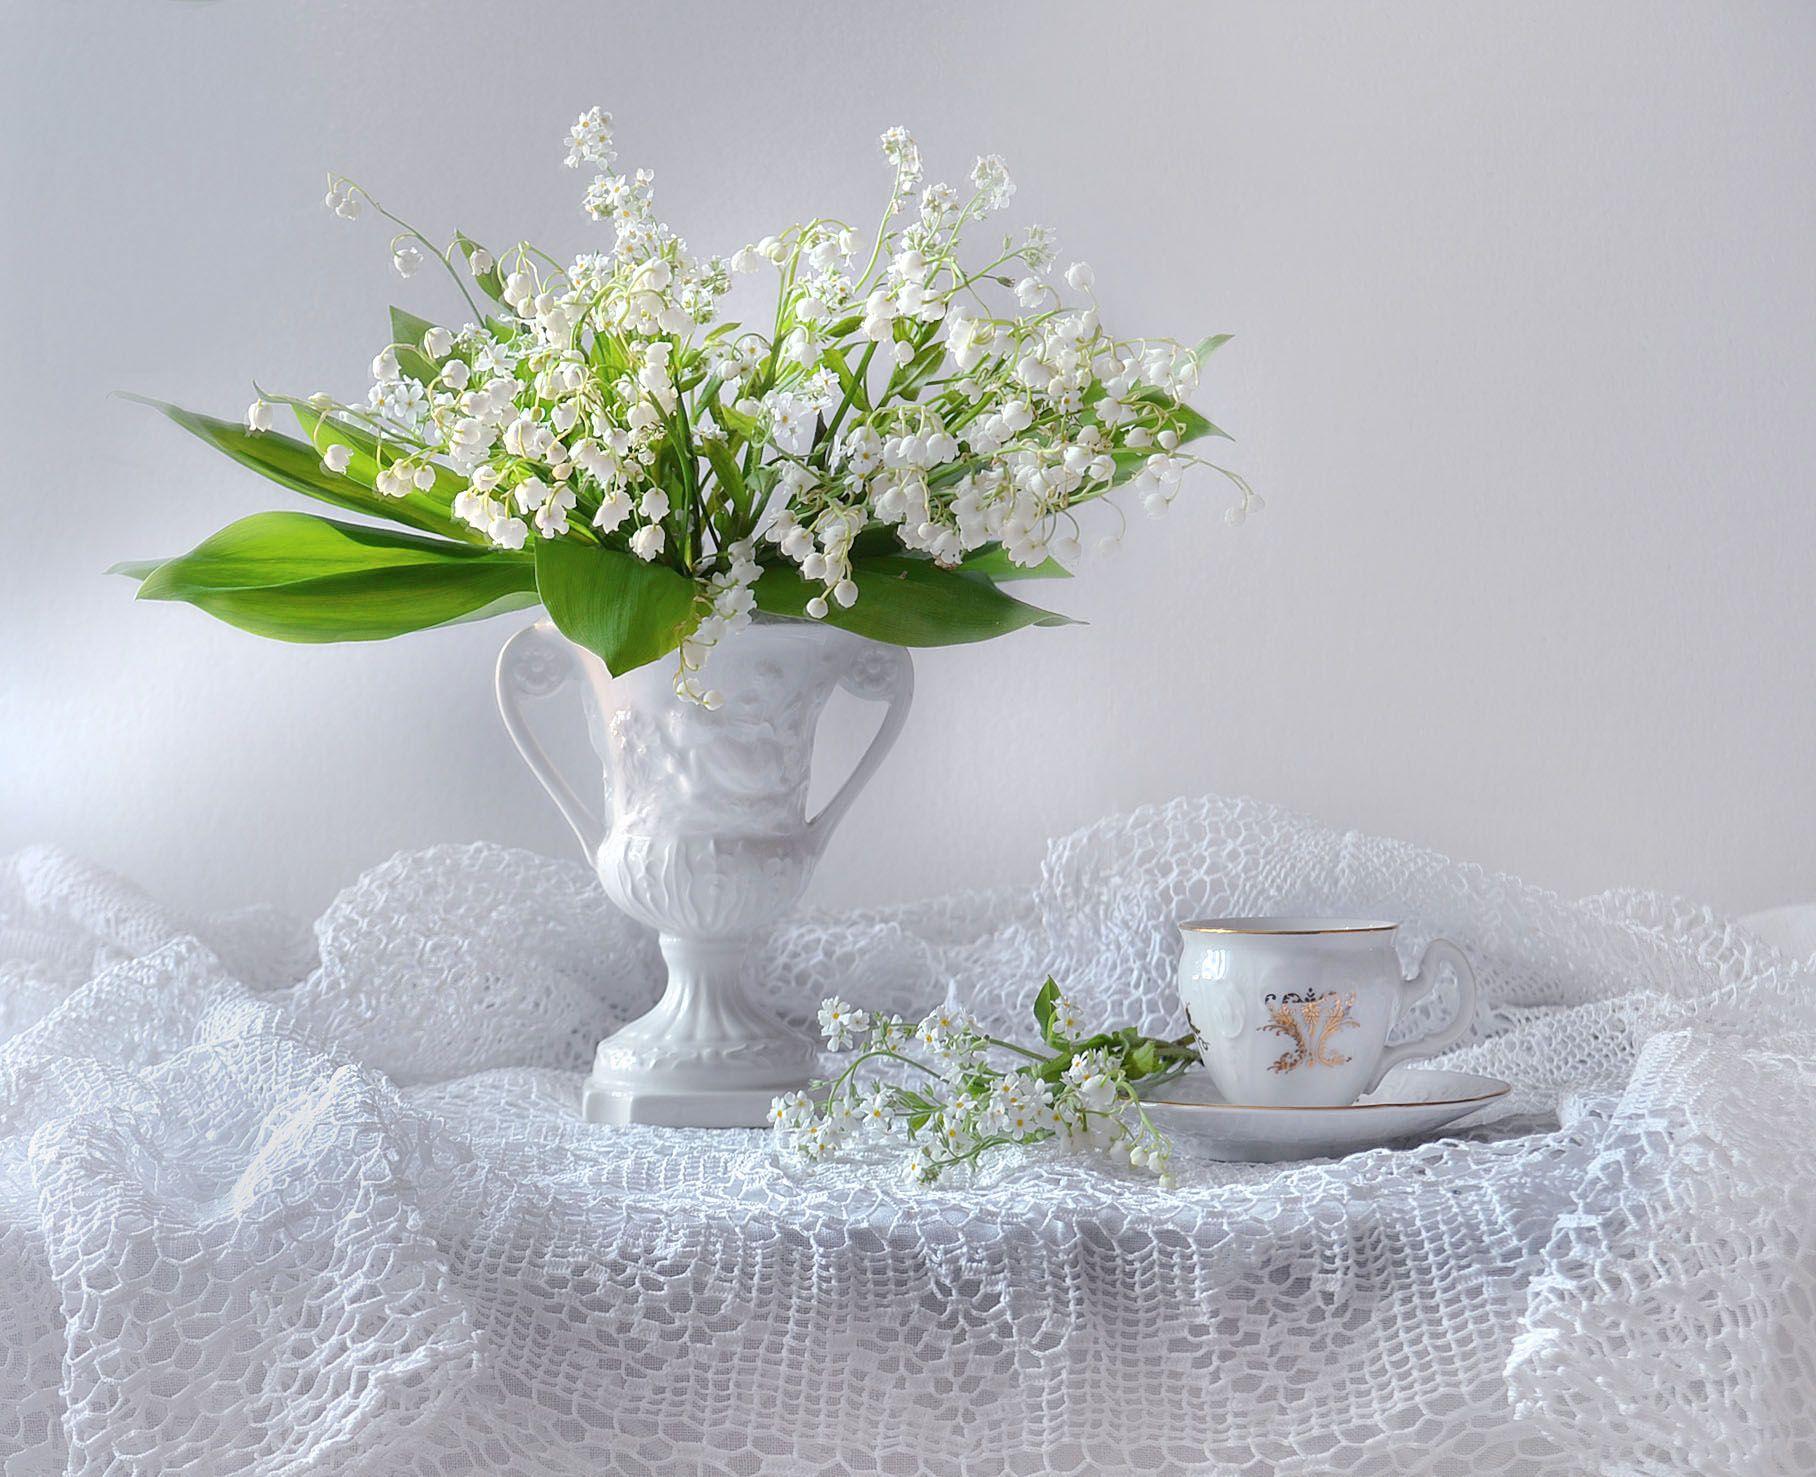 still life, натюрморт , апрель, весна,    фото натюрморт, цветы, ландыши, Колова Валентина